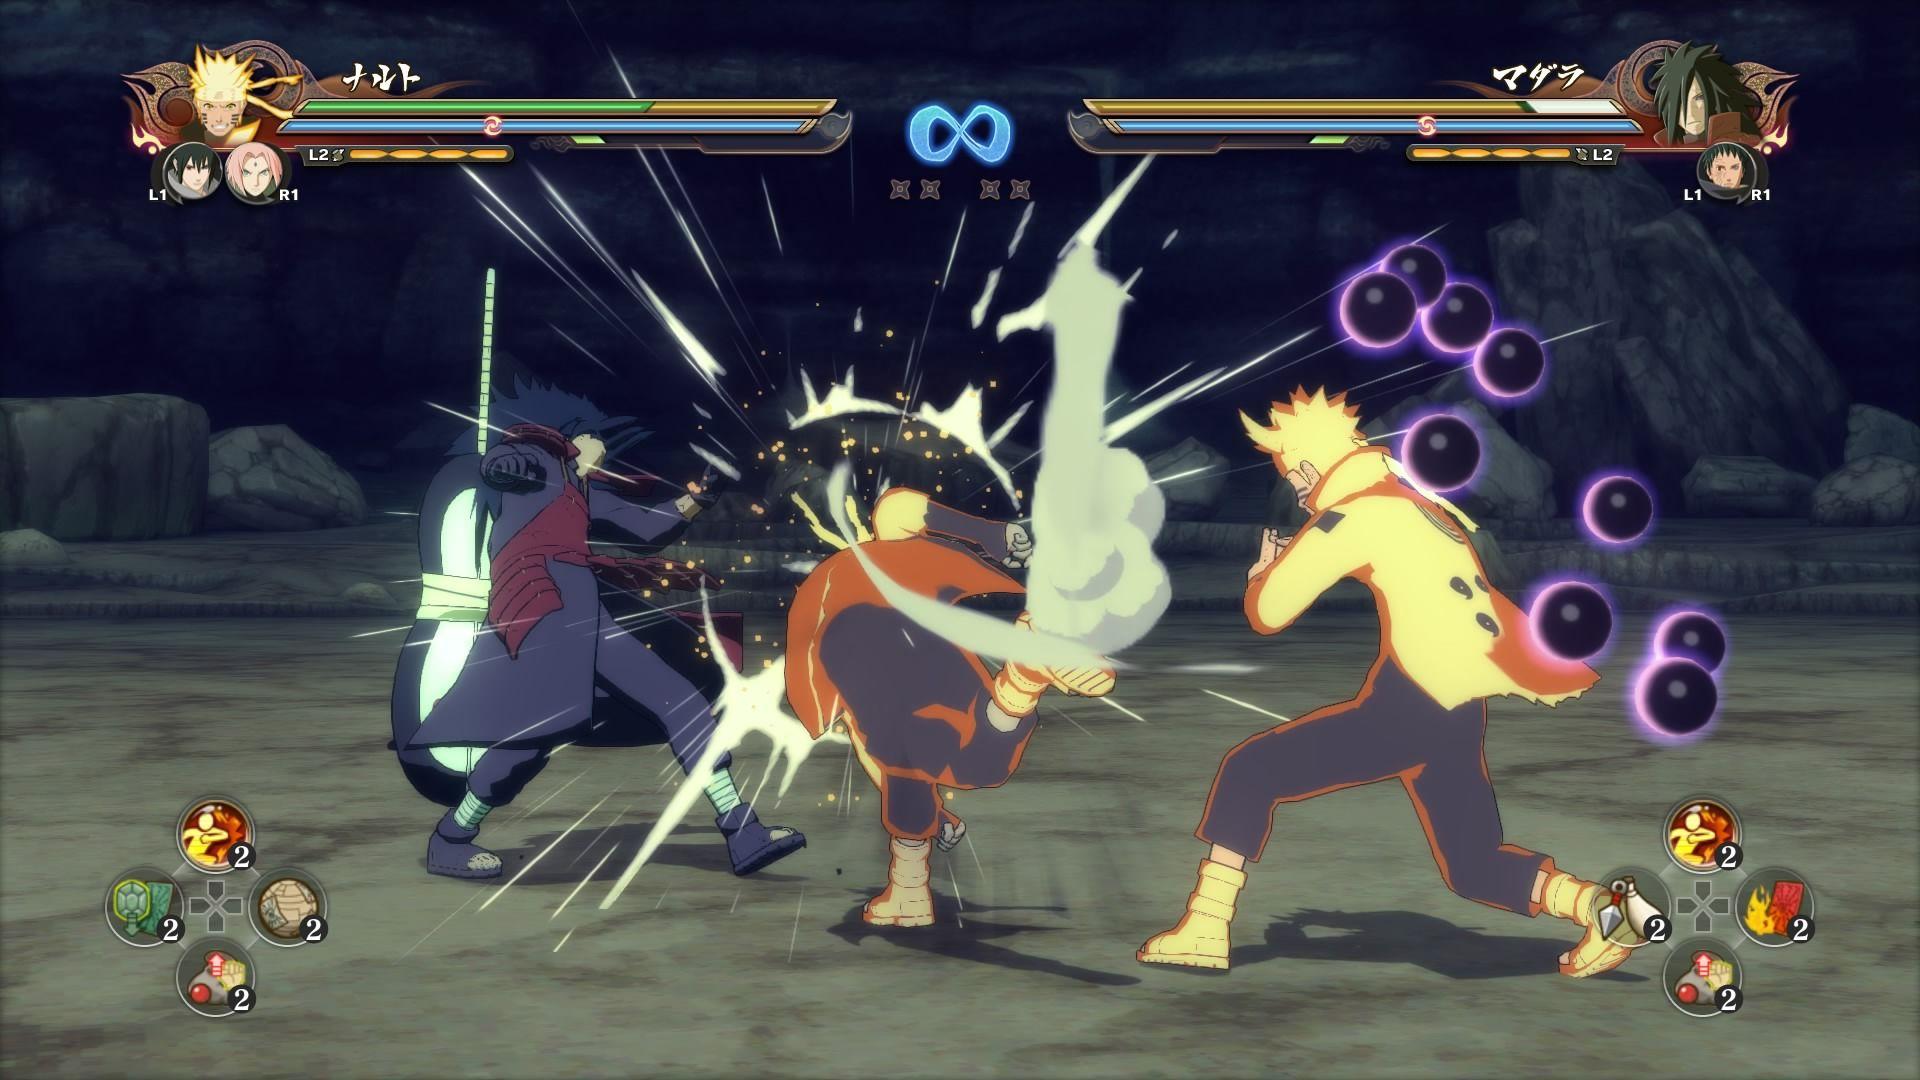 naruto ultimate ninja storm 4 combat   edwin   Naruto